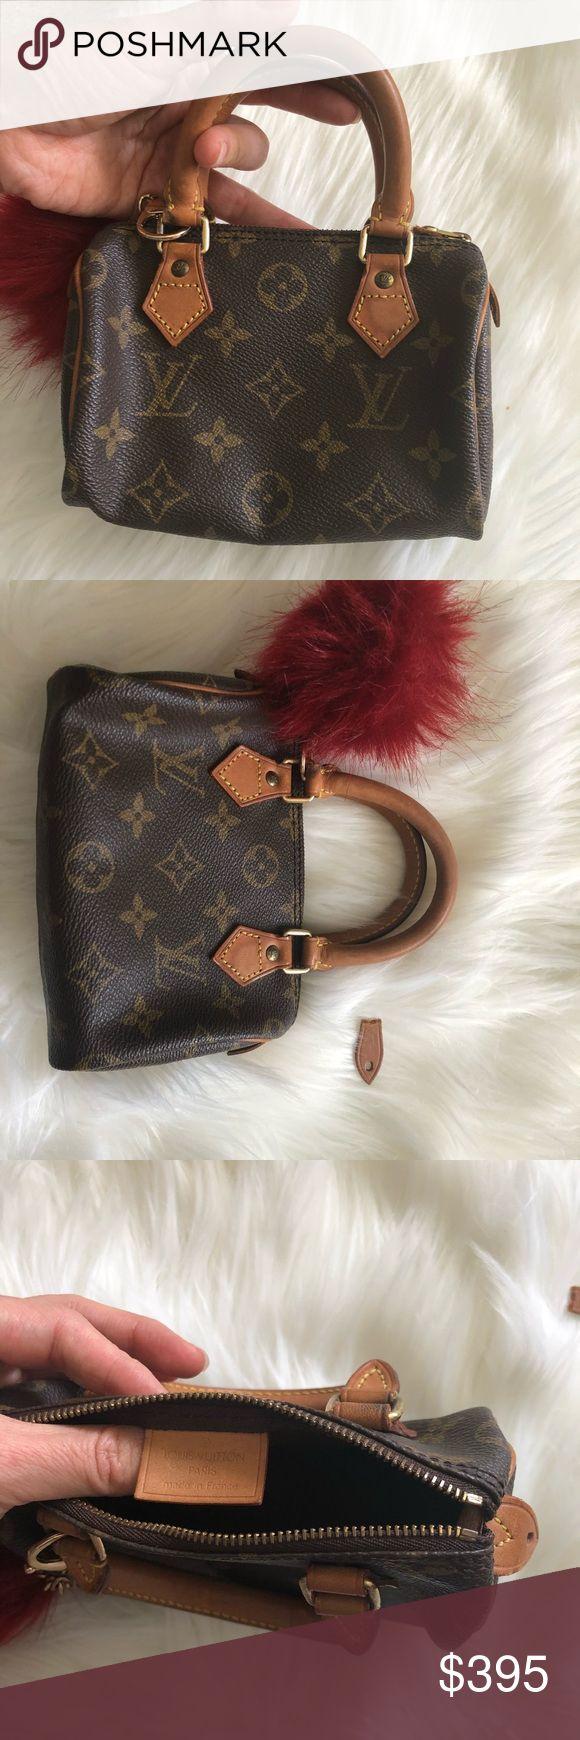 Authentic Louis Vuitton mini speedy Authentic Louis Vuitton mini speedy Louis Vuitton Bags Mini Bags